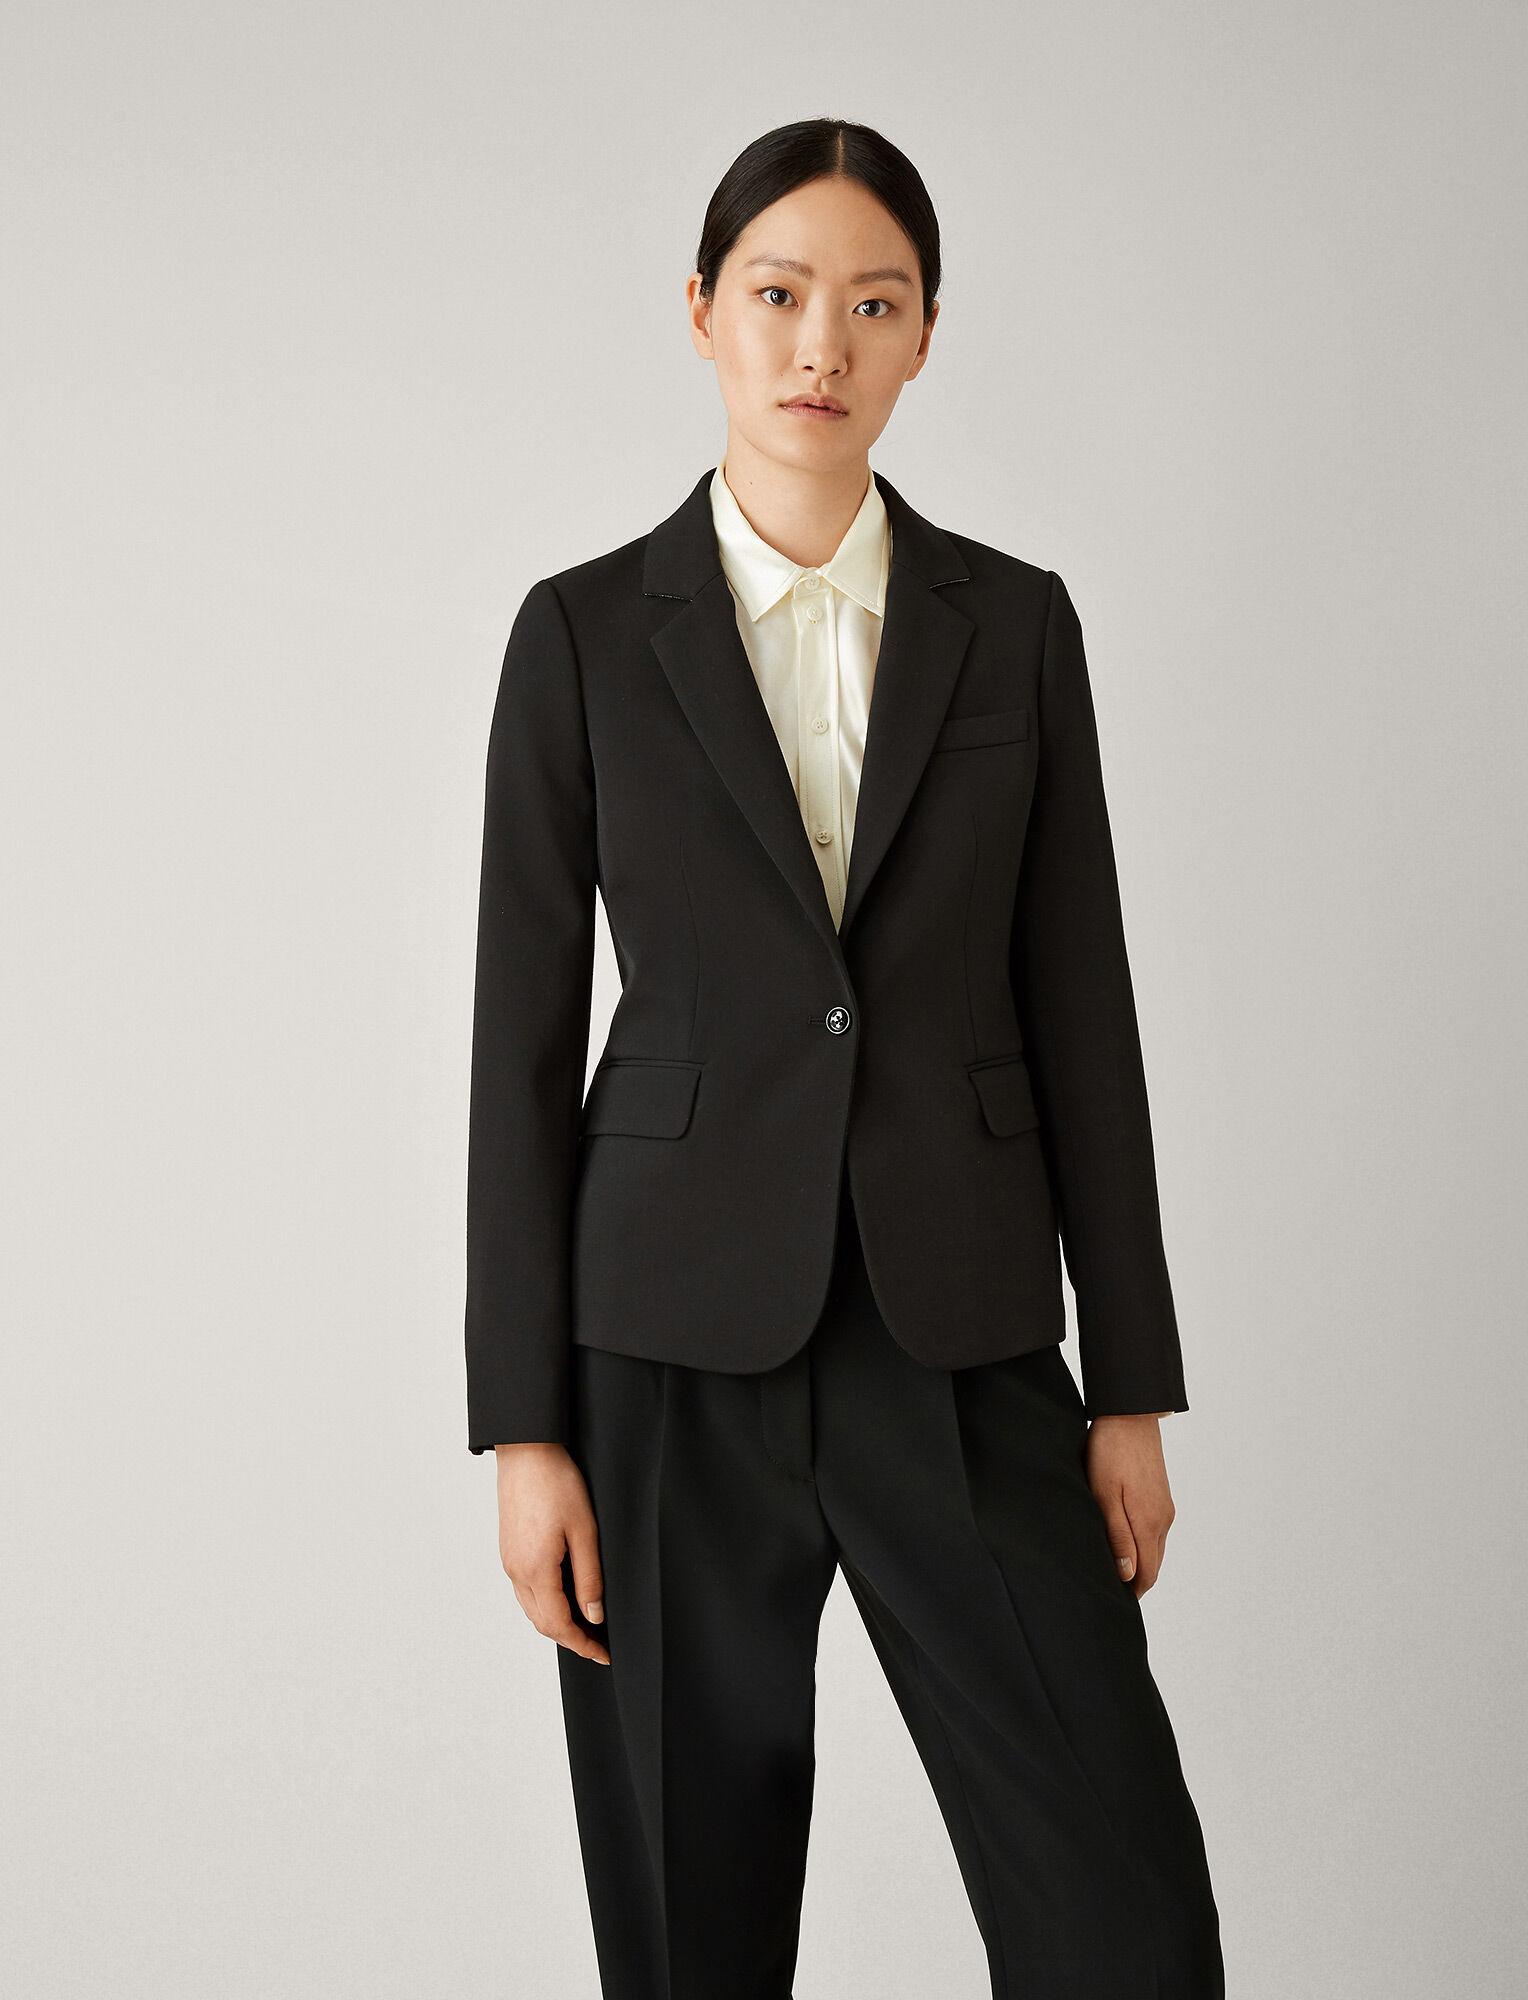 Joseph, Imma Comfort Wool Jacket, in BLACK